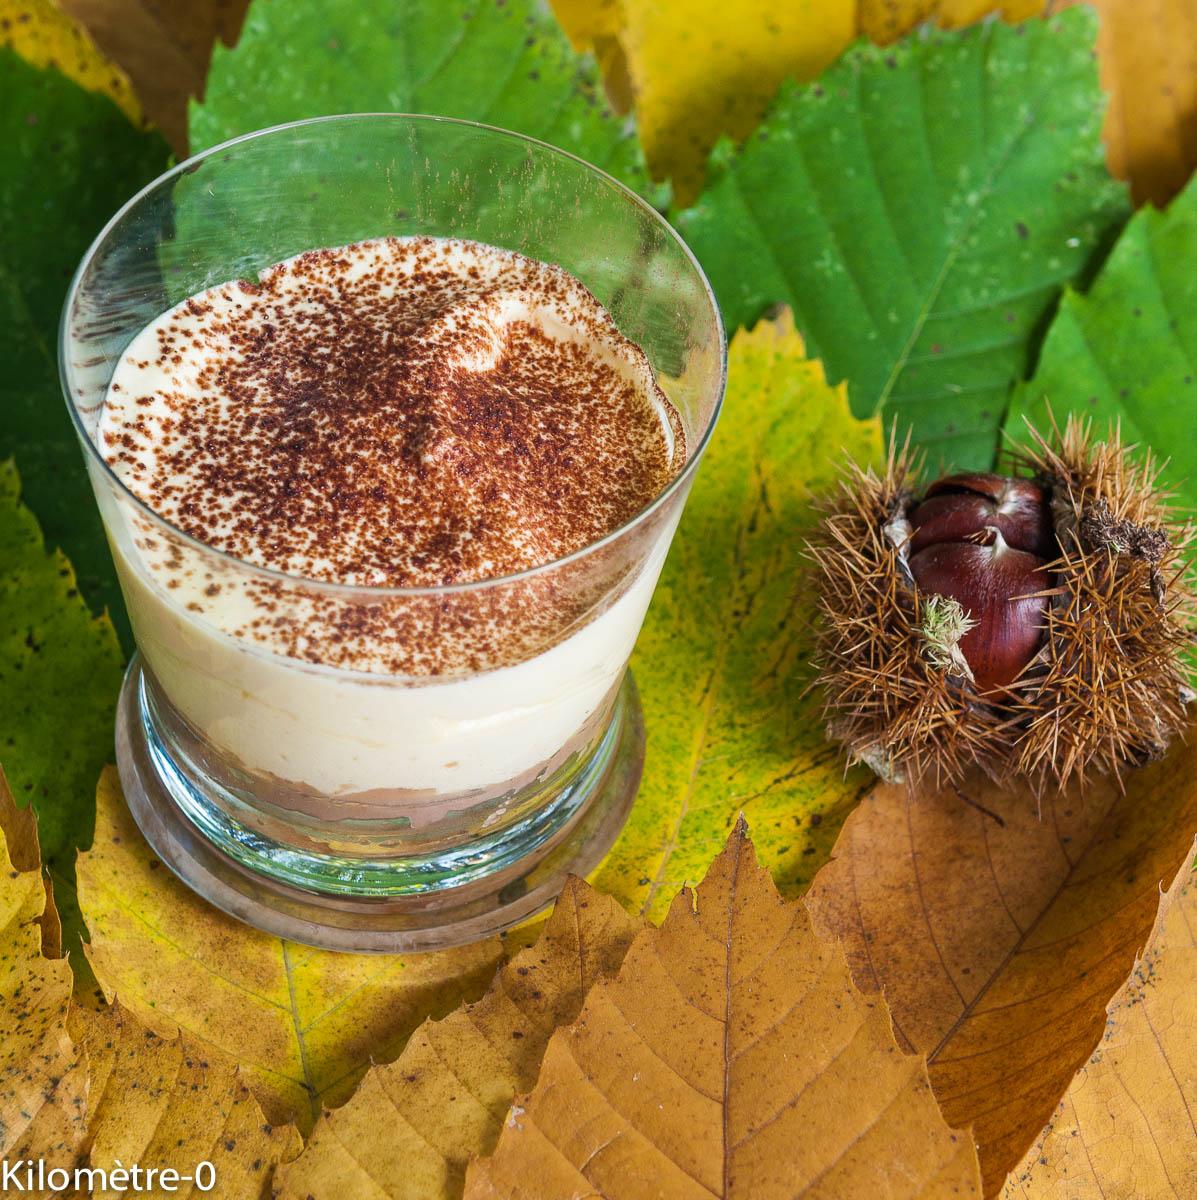 image de recette facile, rapide, économique, bio, léger, fruits, châtaignes, automne, tiramisun dessert italien, italienne, Italie de  dessert de Kilomètre-0